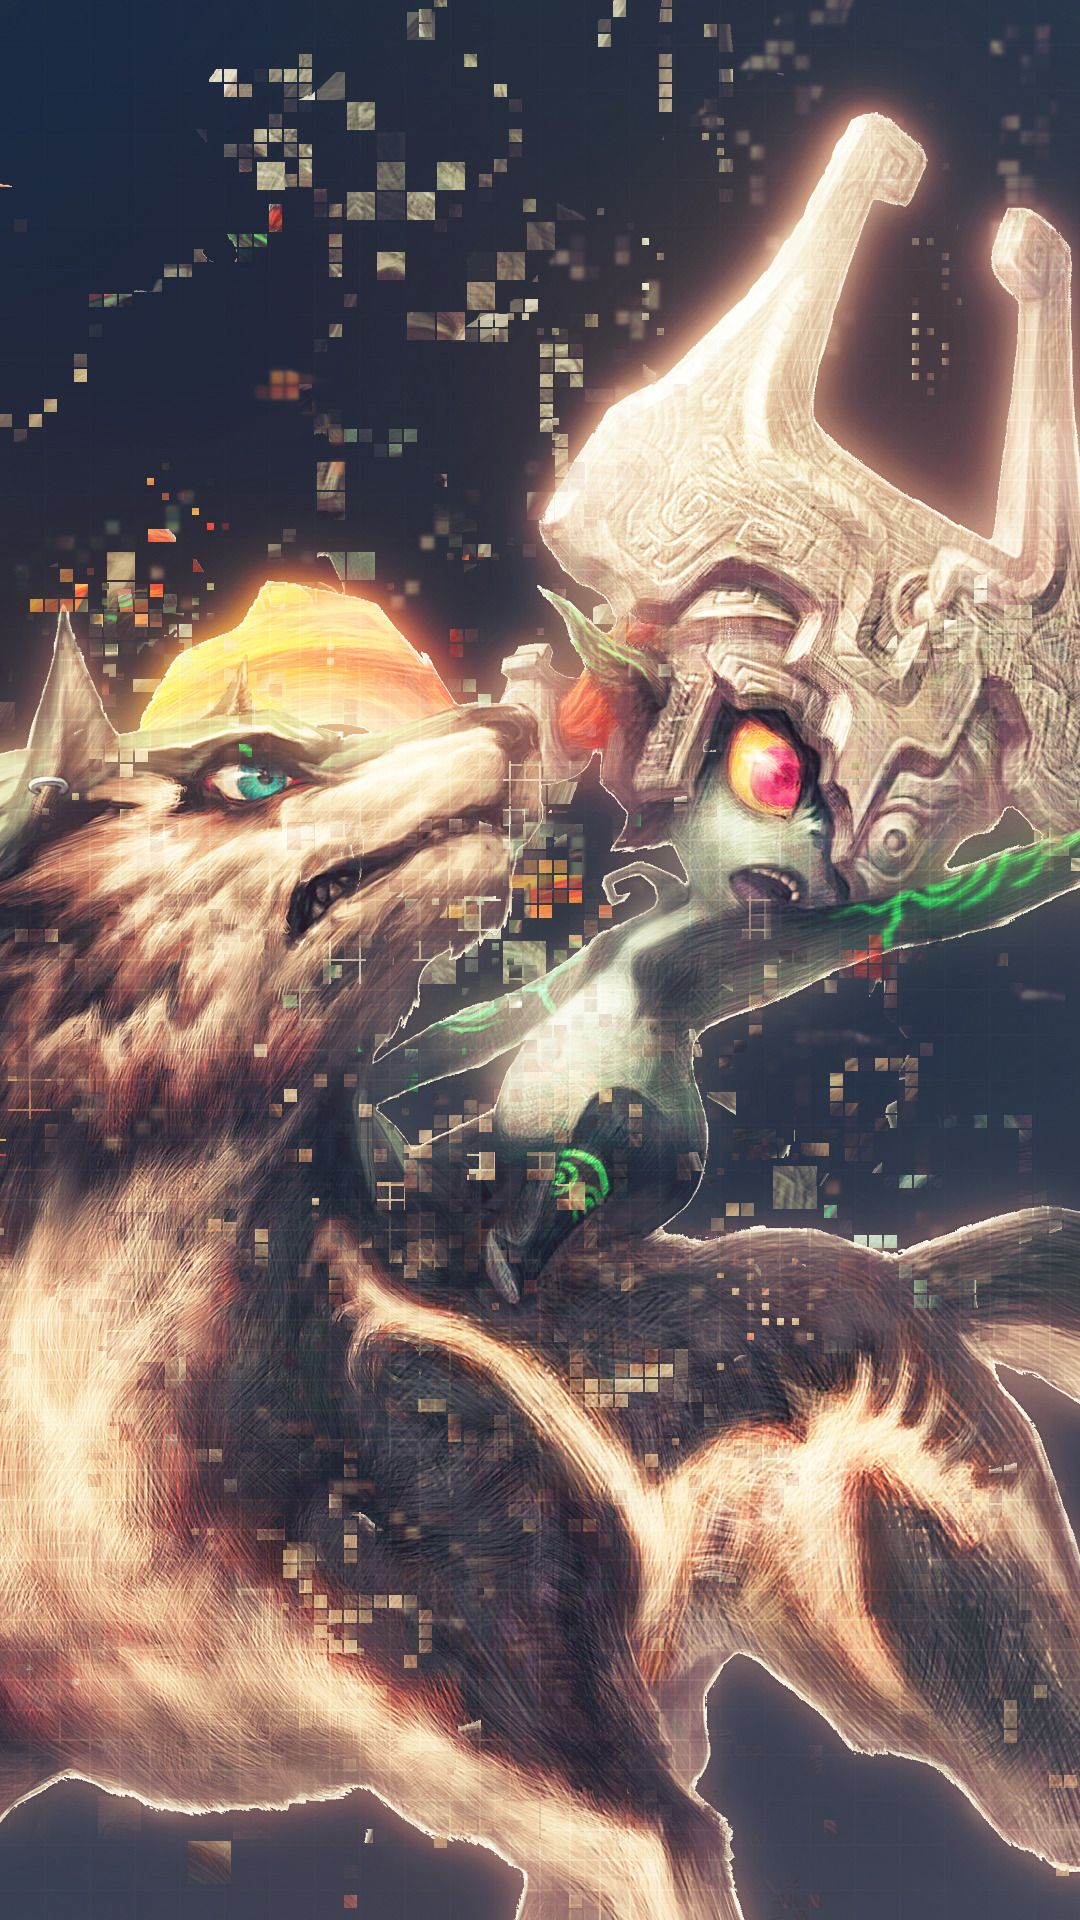 Legend of Zelda Blog — the perfect... Image jeux video